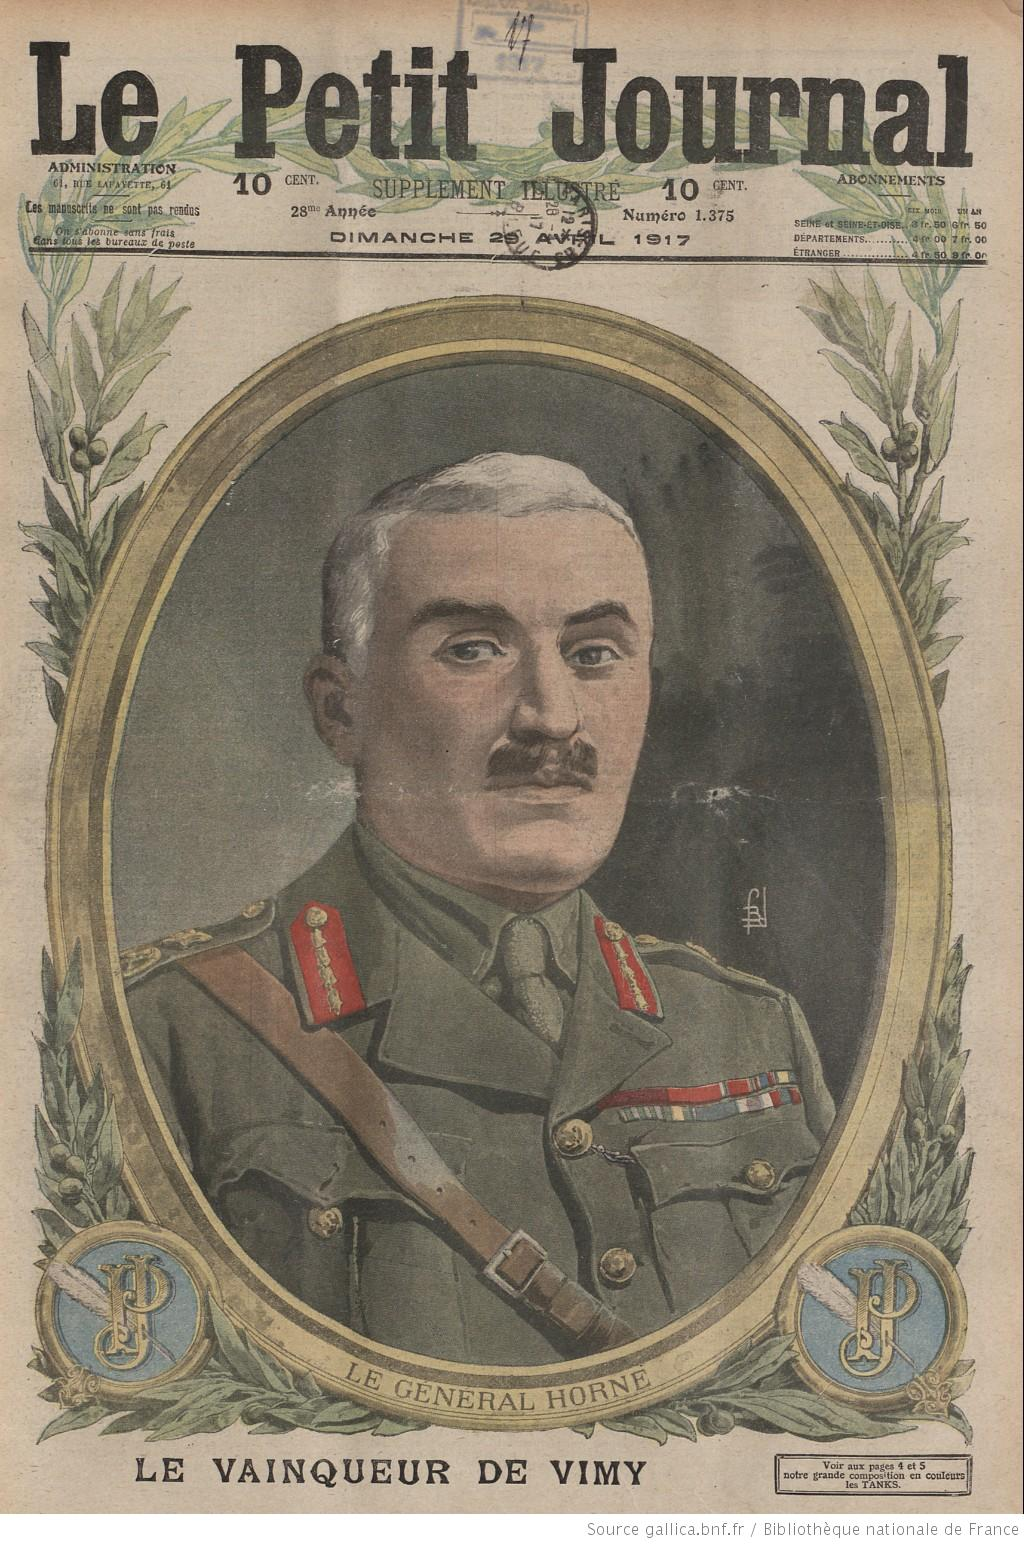 LPJ Illustre 1917-04-29 A.jpg